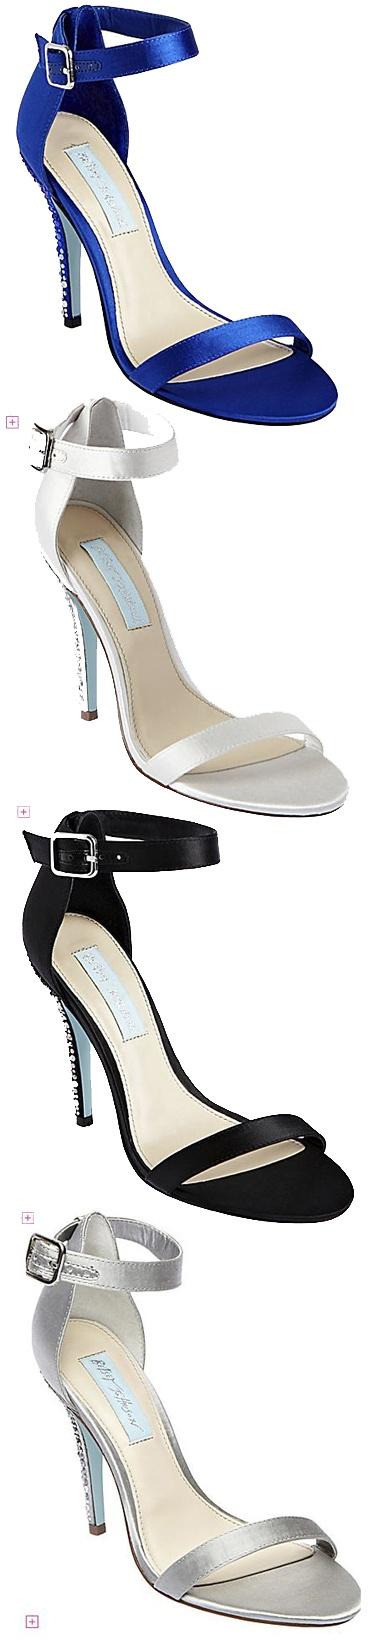 SB BELLS womens evening high ankle strap Design works No.637  2013 Fashion High Heels 